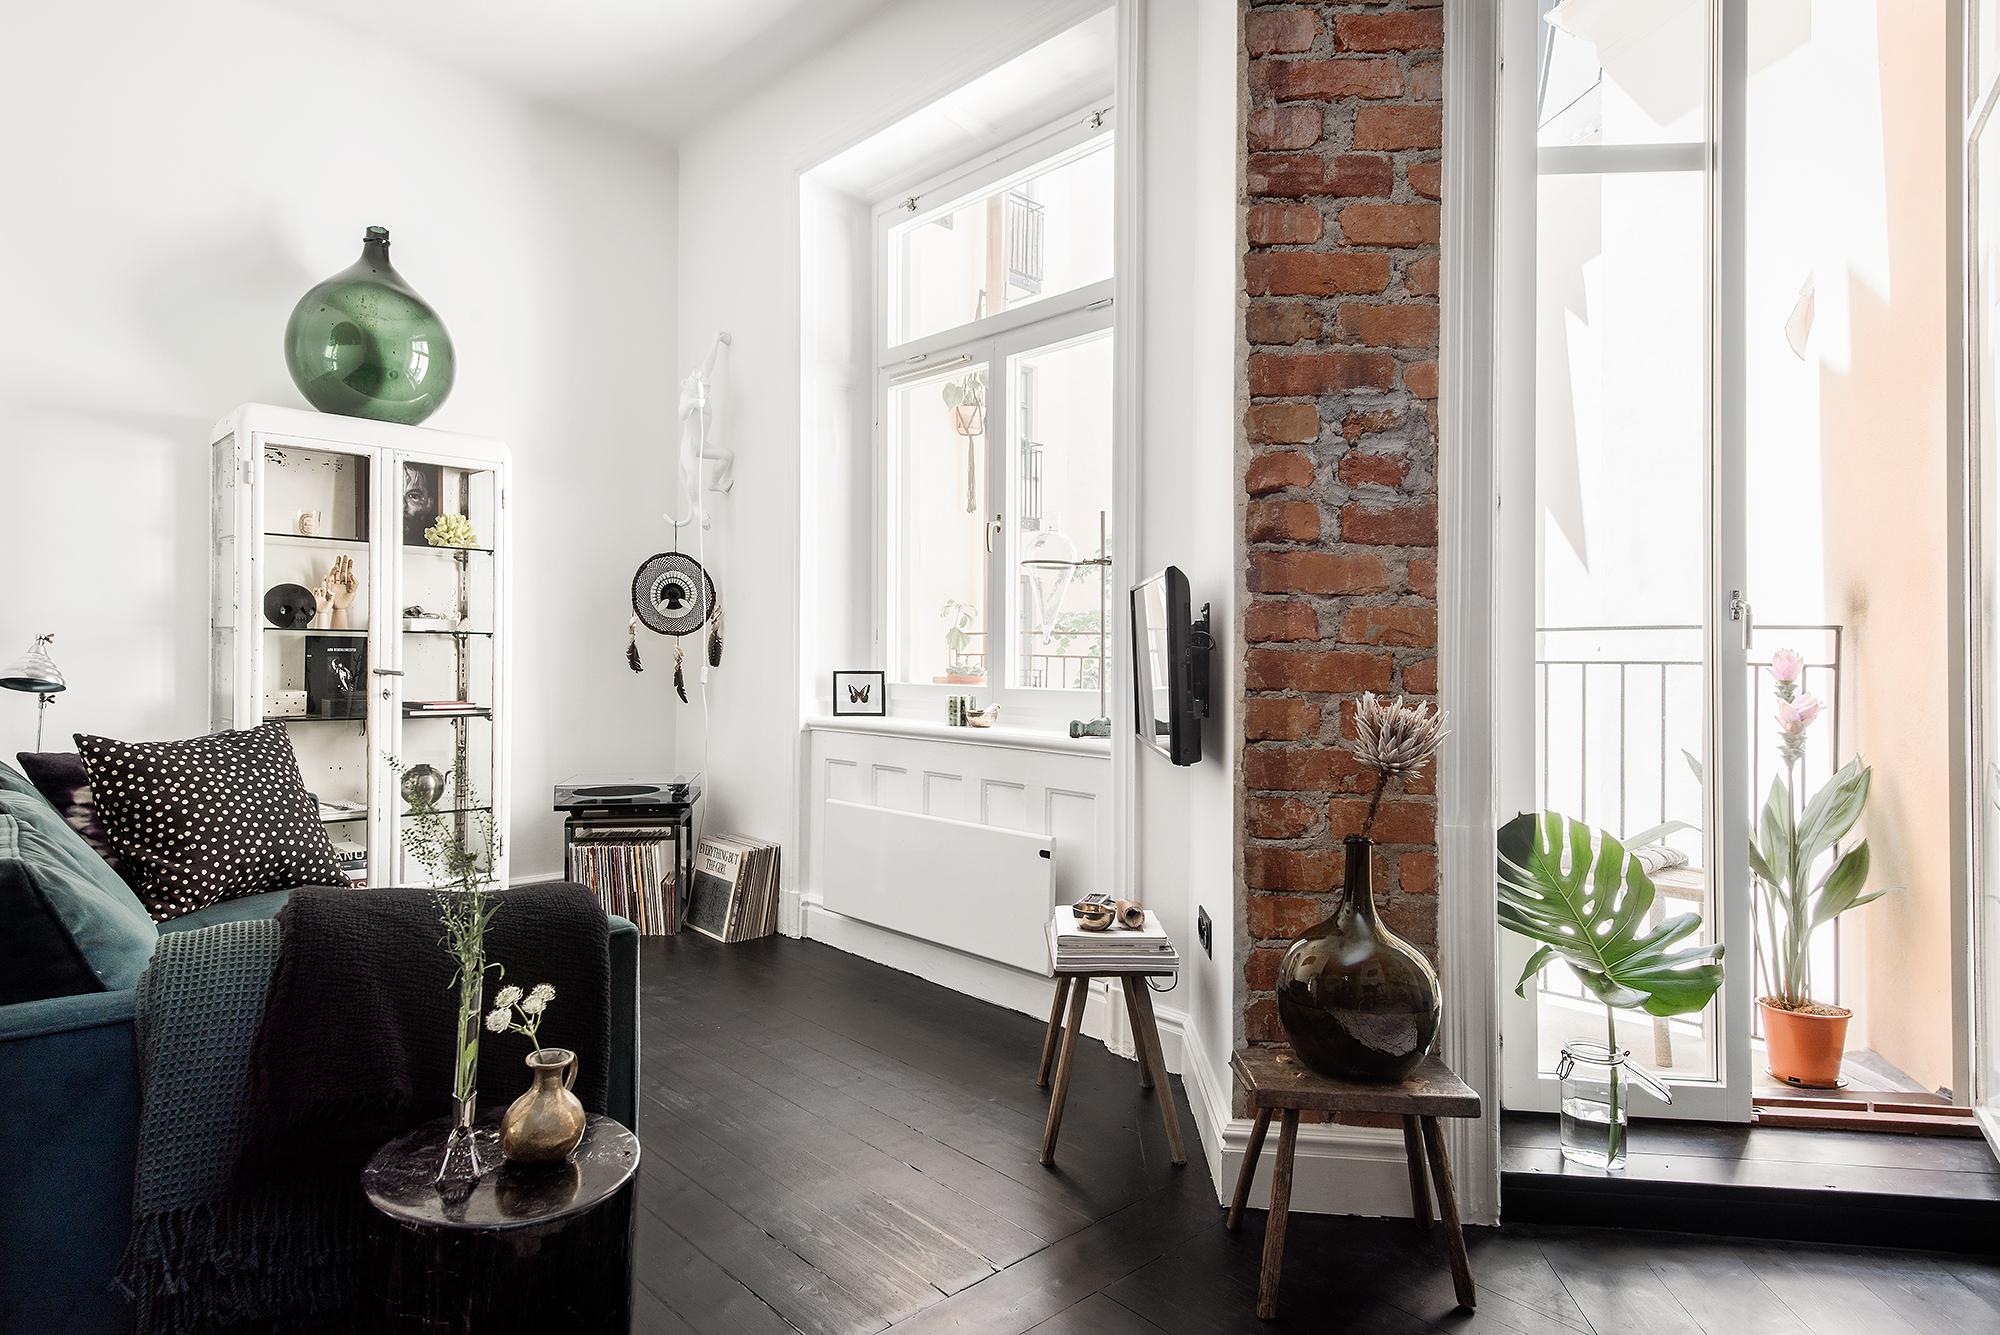 Inspiratie Kleine Woonkamer : Inspirerende kleine woonkamer van appartement van 42m2 huis